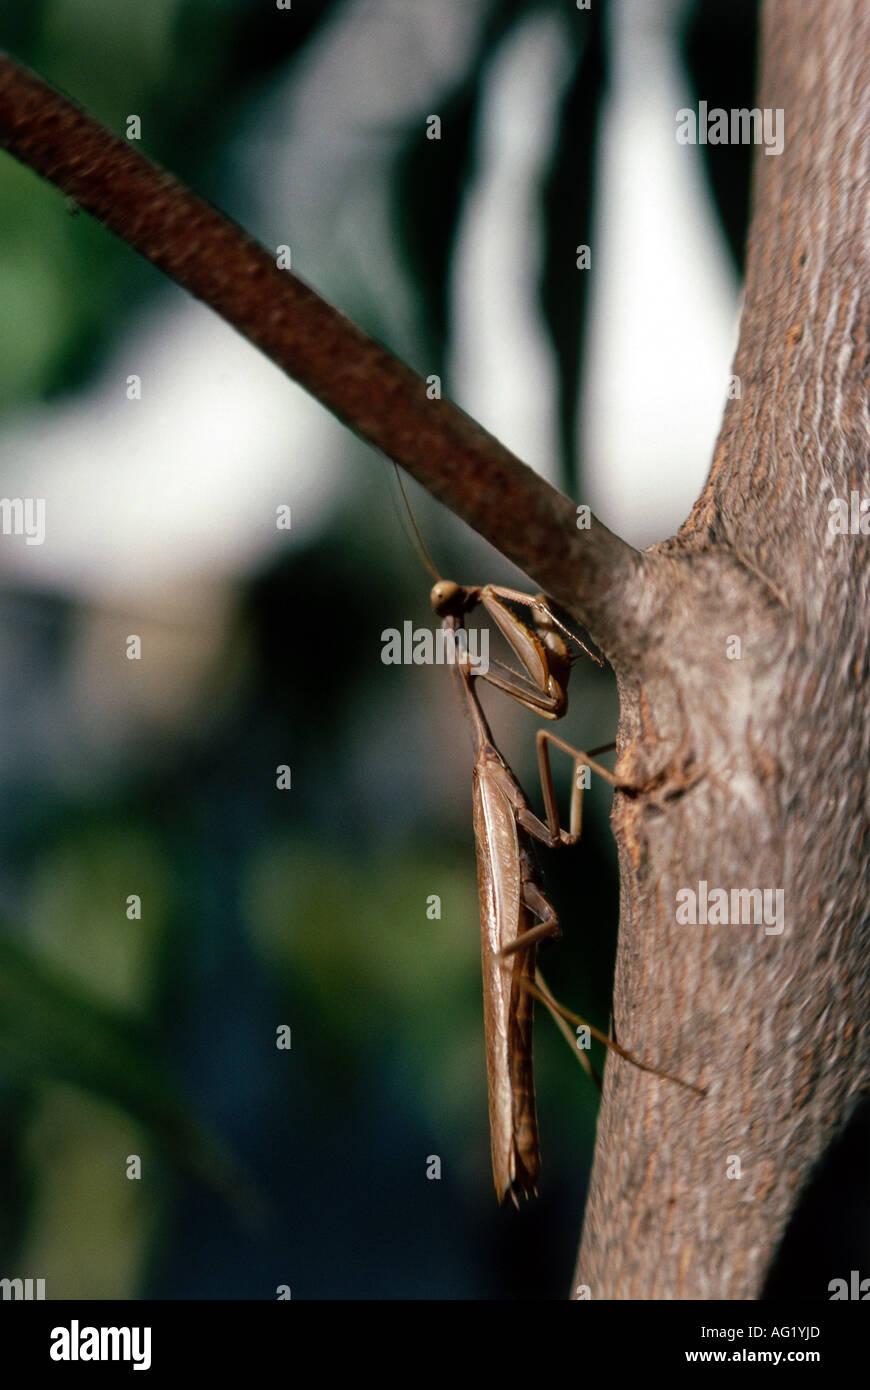 zoology / animals, insect, Mantidae, European mantis (Mantis religiosa), sitting, bole, distribution: Southern Europe, Neoptera, - Stock Image